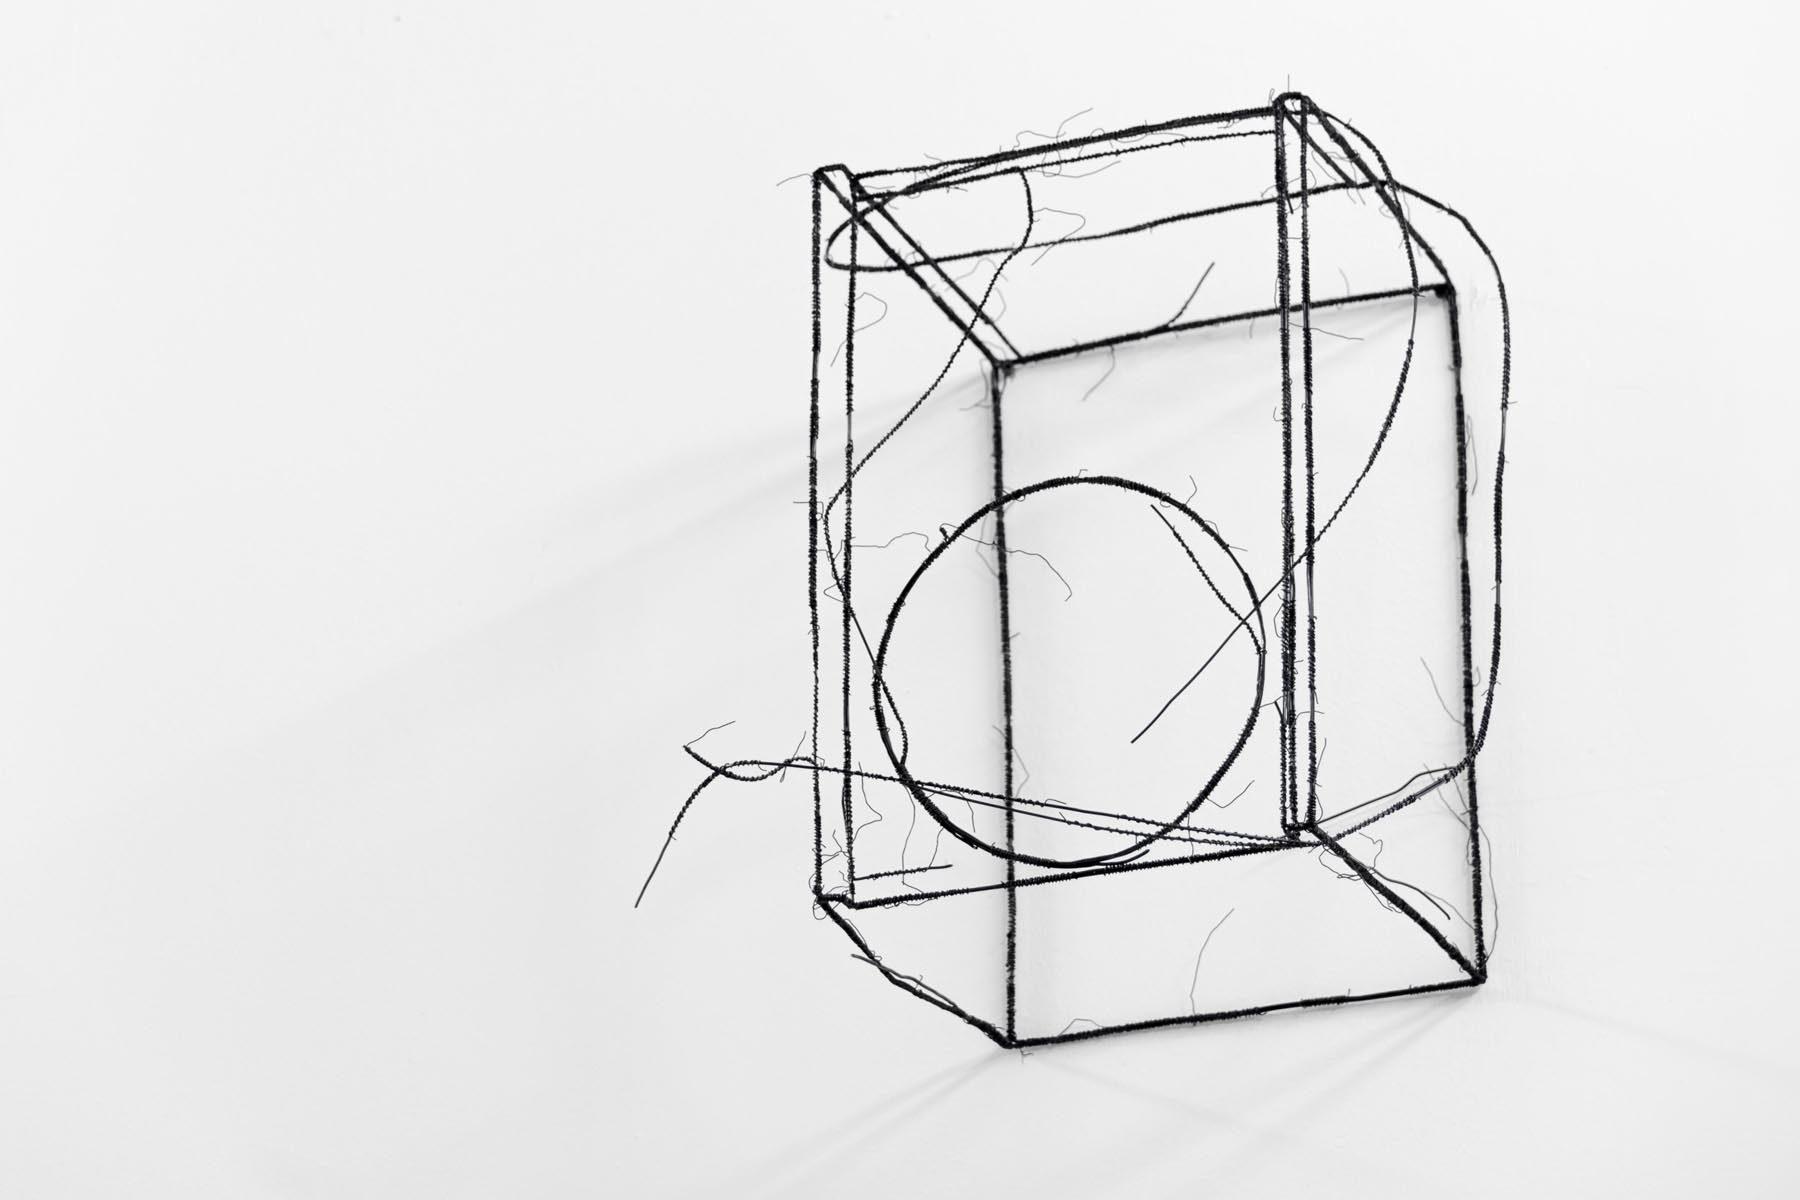 Fritz Panzer, Lautsprechenboxen, 2012, wire sculpture, 27 x 27 x 50 cm